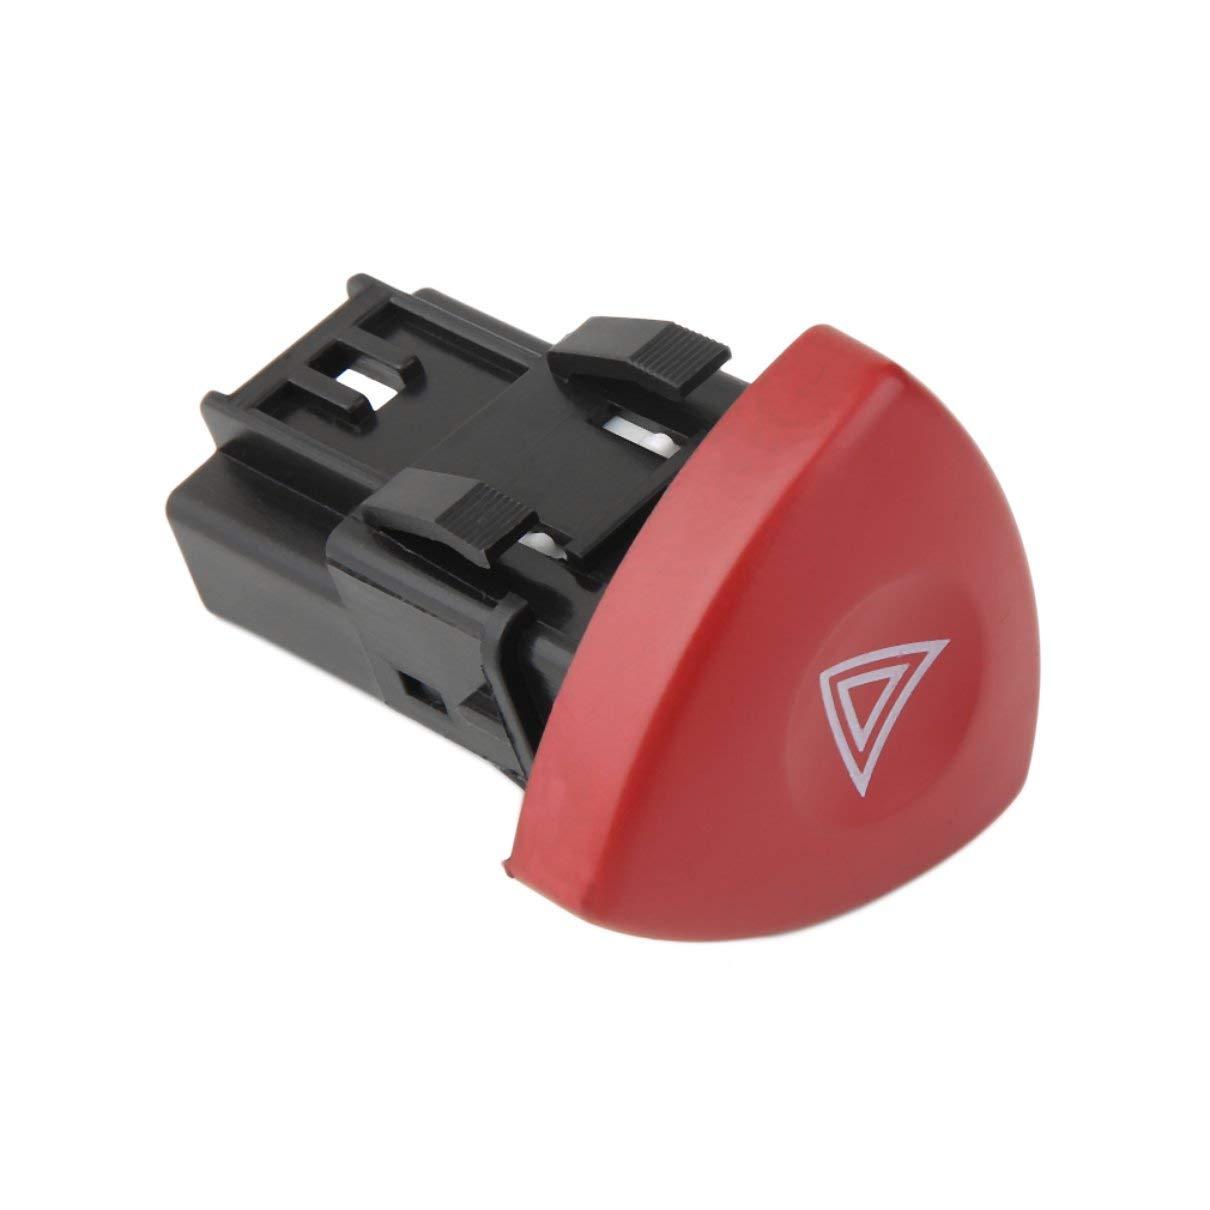 SaraHew74 Emergenza Pericolo lampeggiatore Spia Warnblinker Schalter per Renault Laa Master Trafic II Vauxhall 01-14